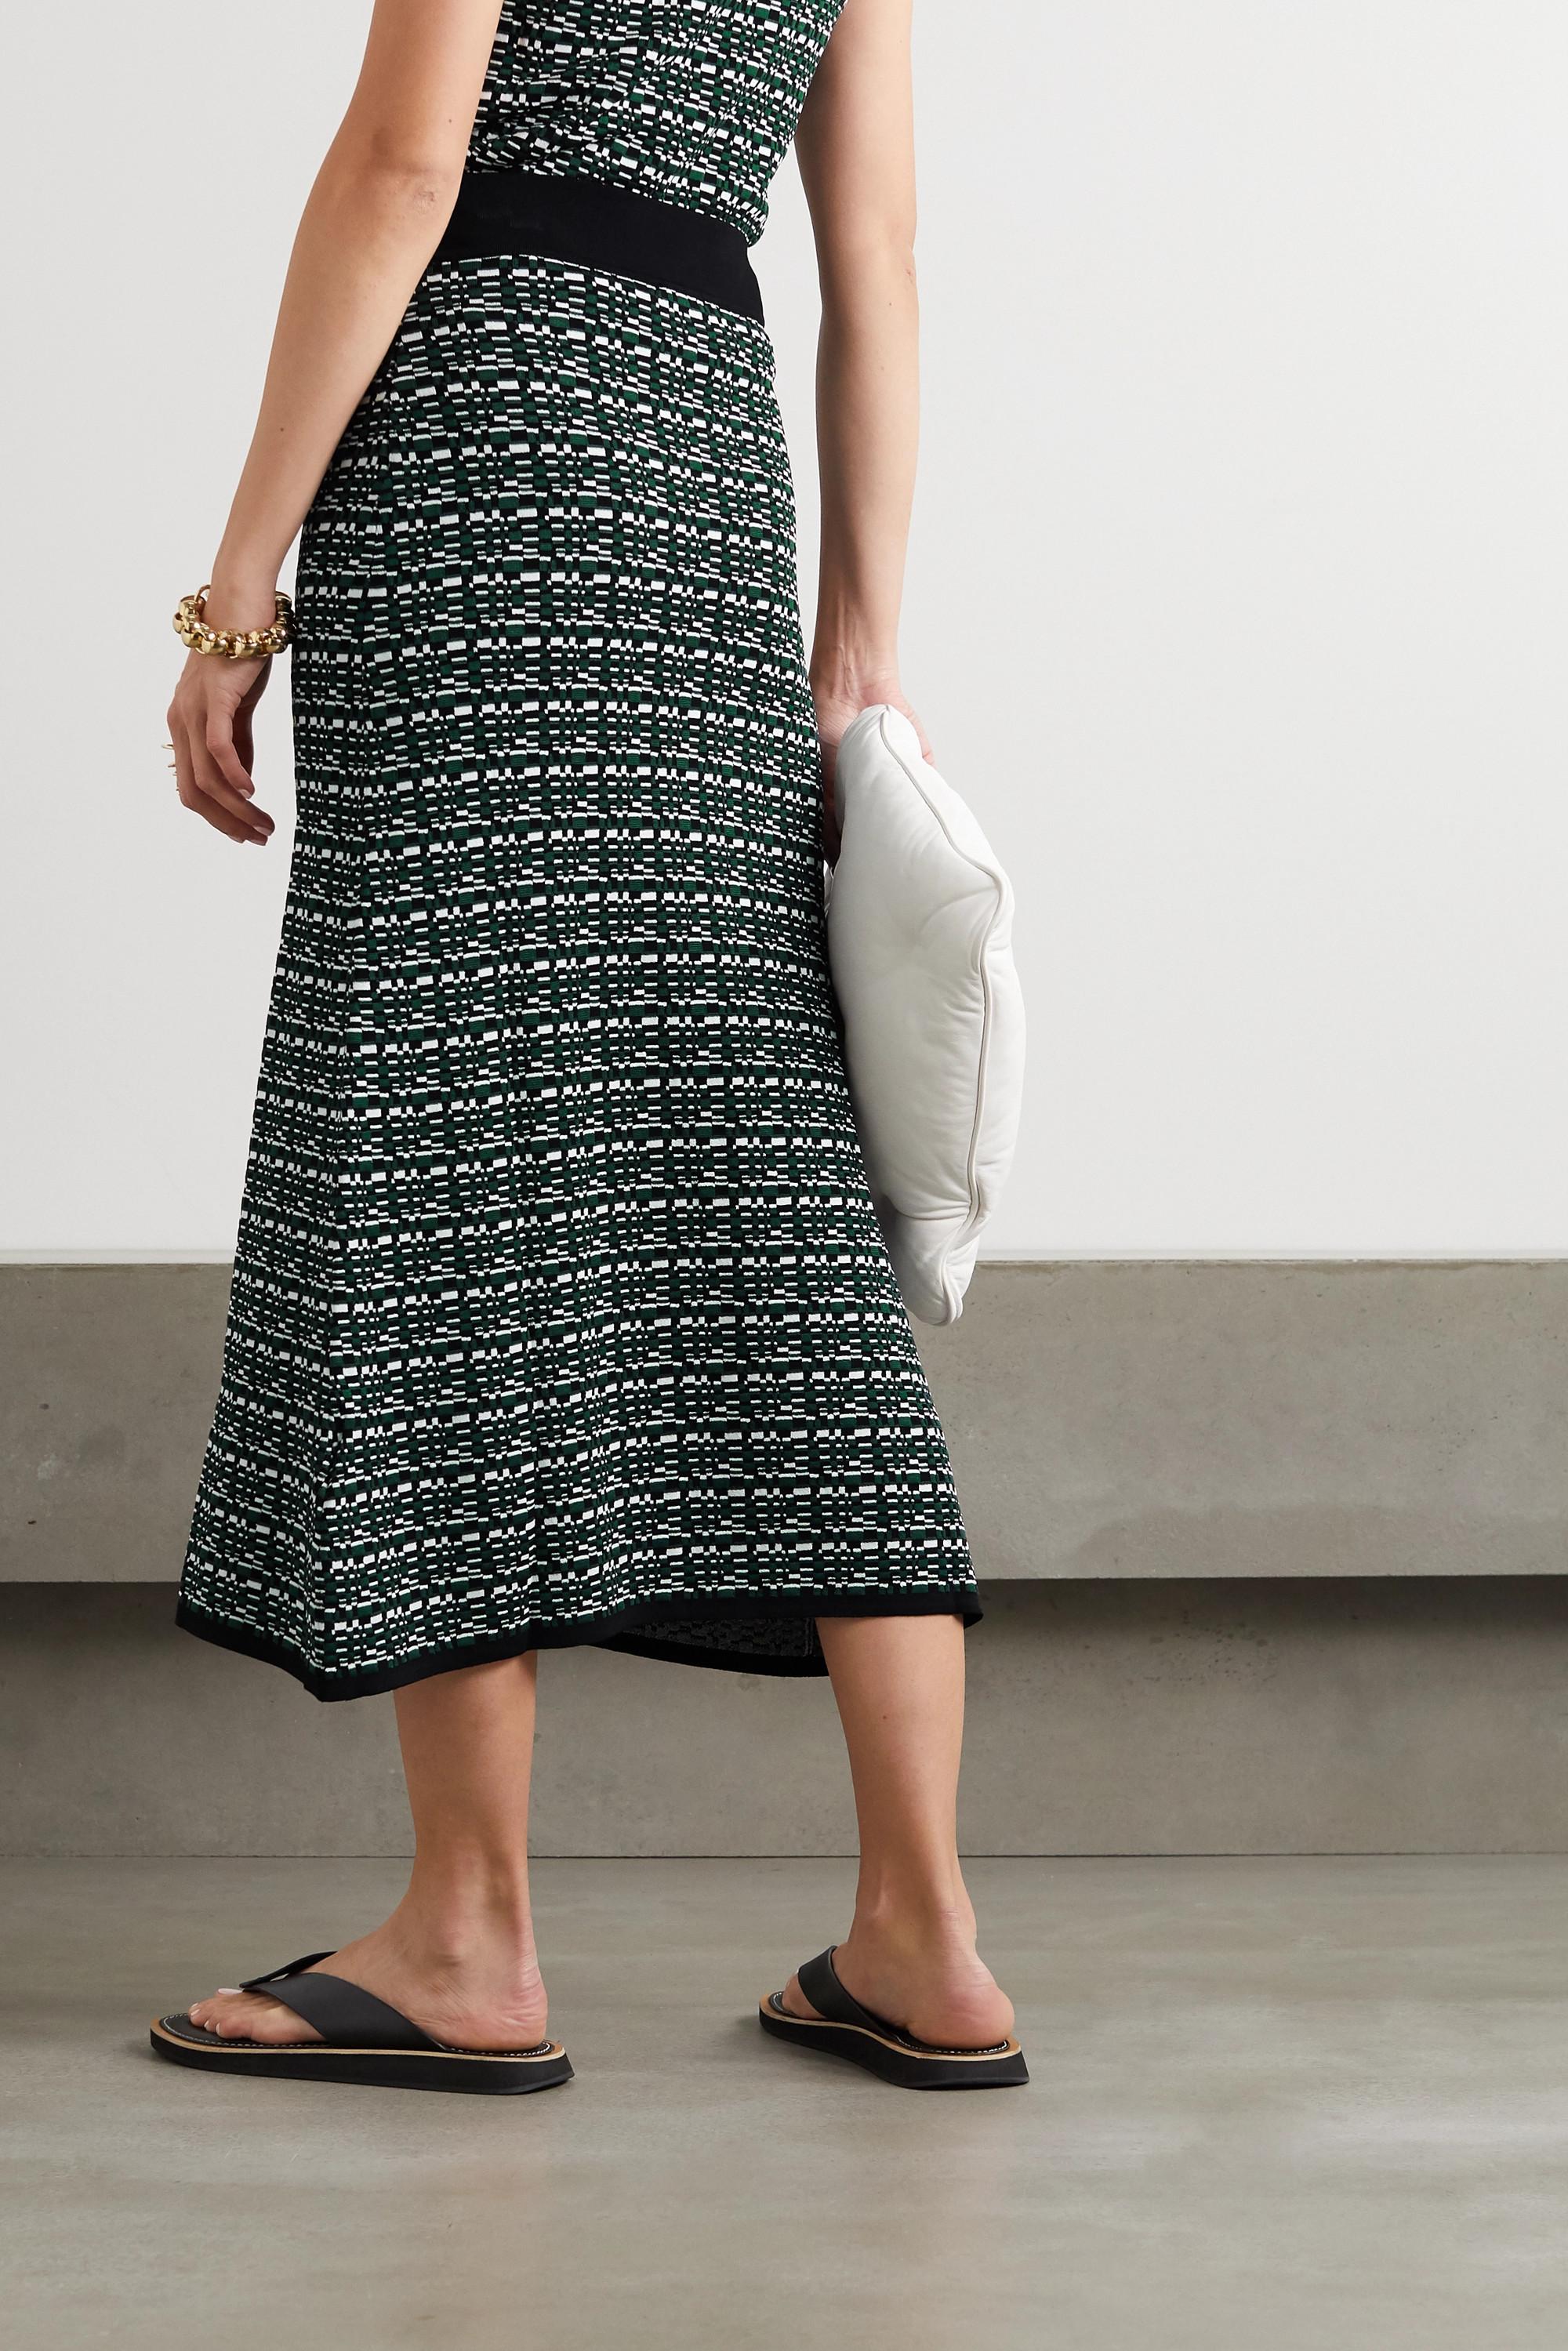 GAUCHERE Raquel jacquard-knit midi skirt